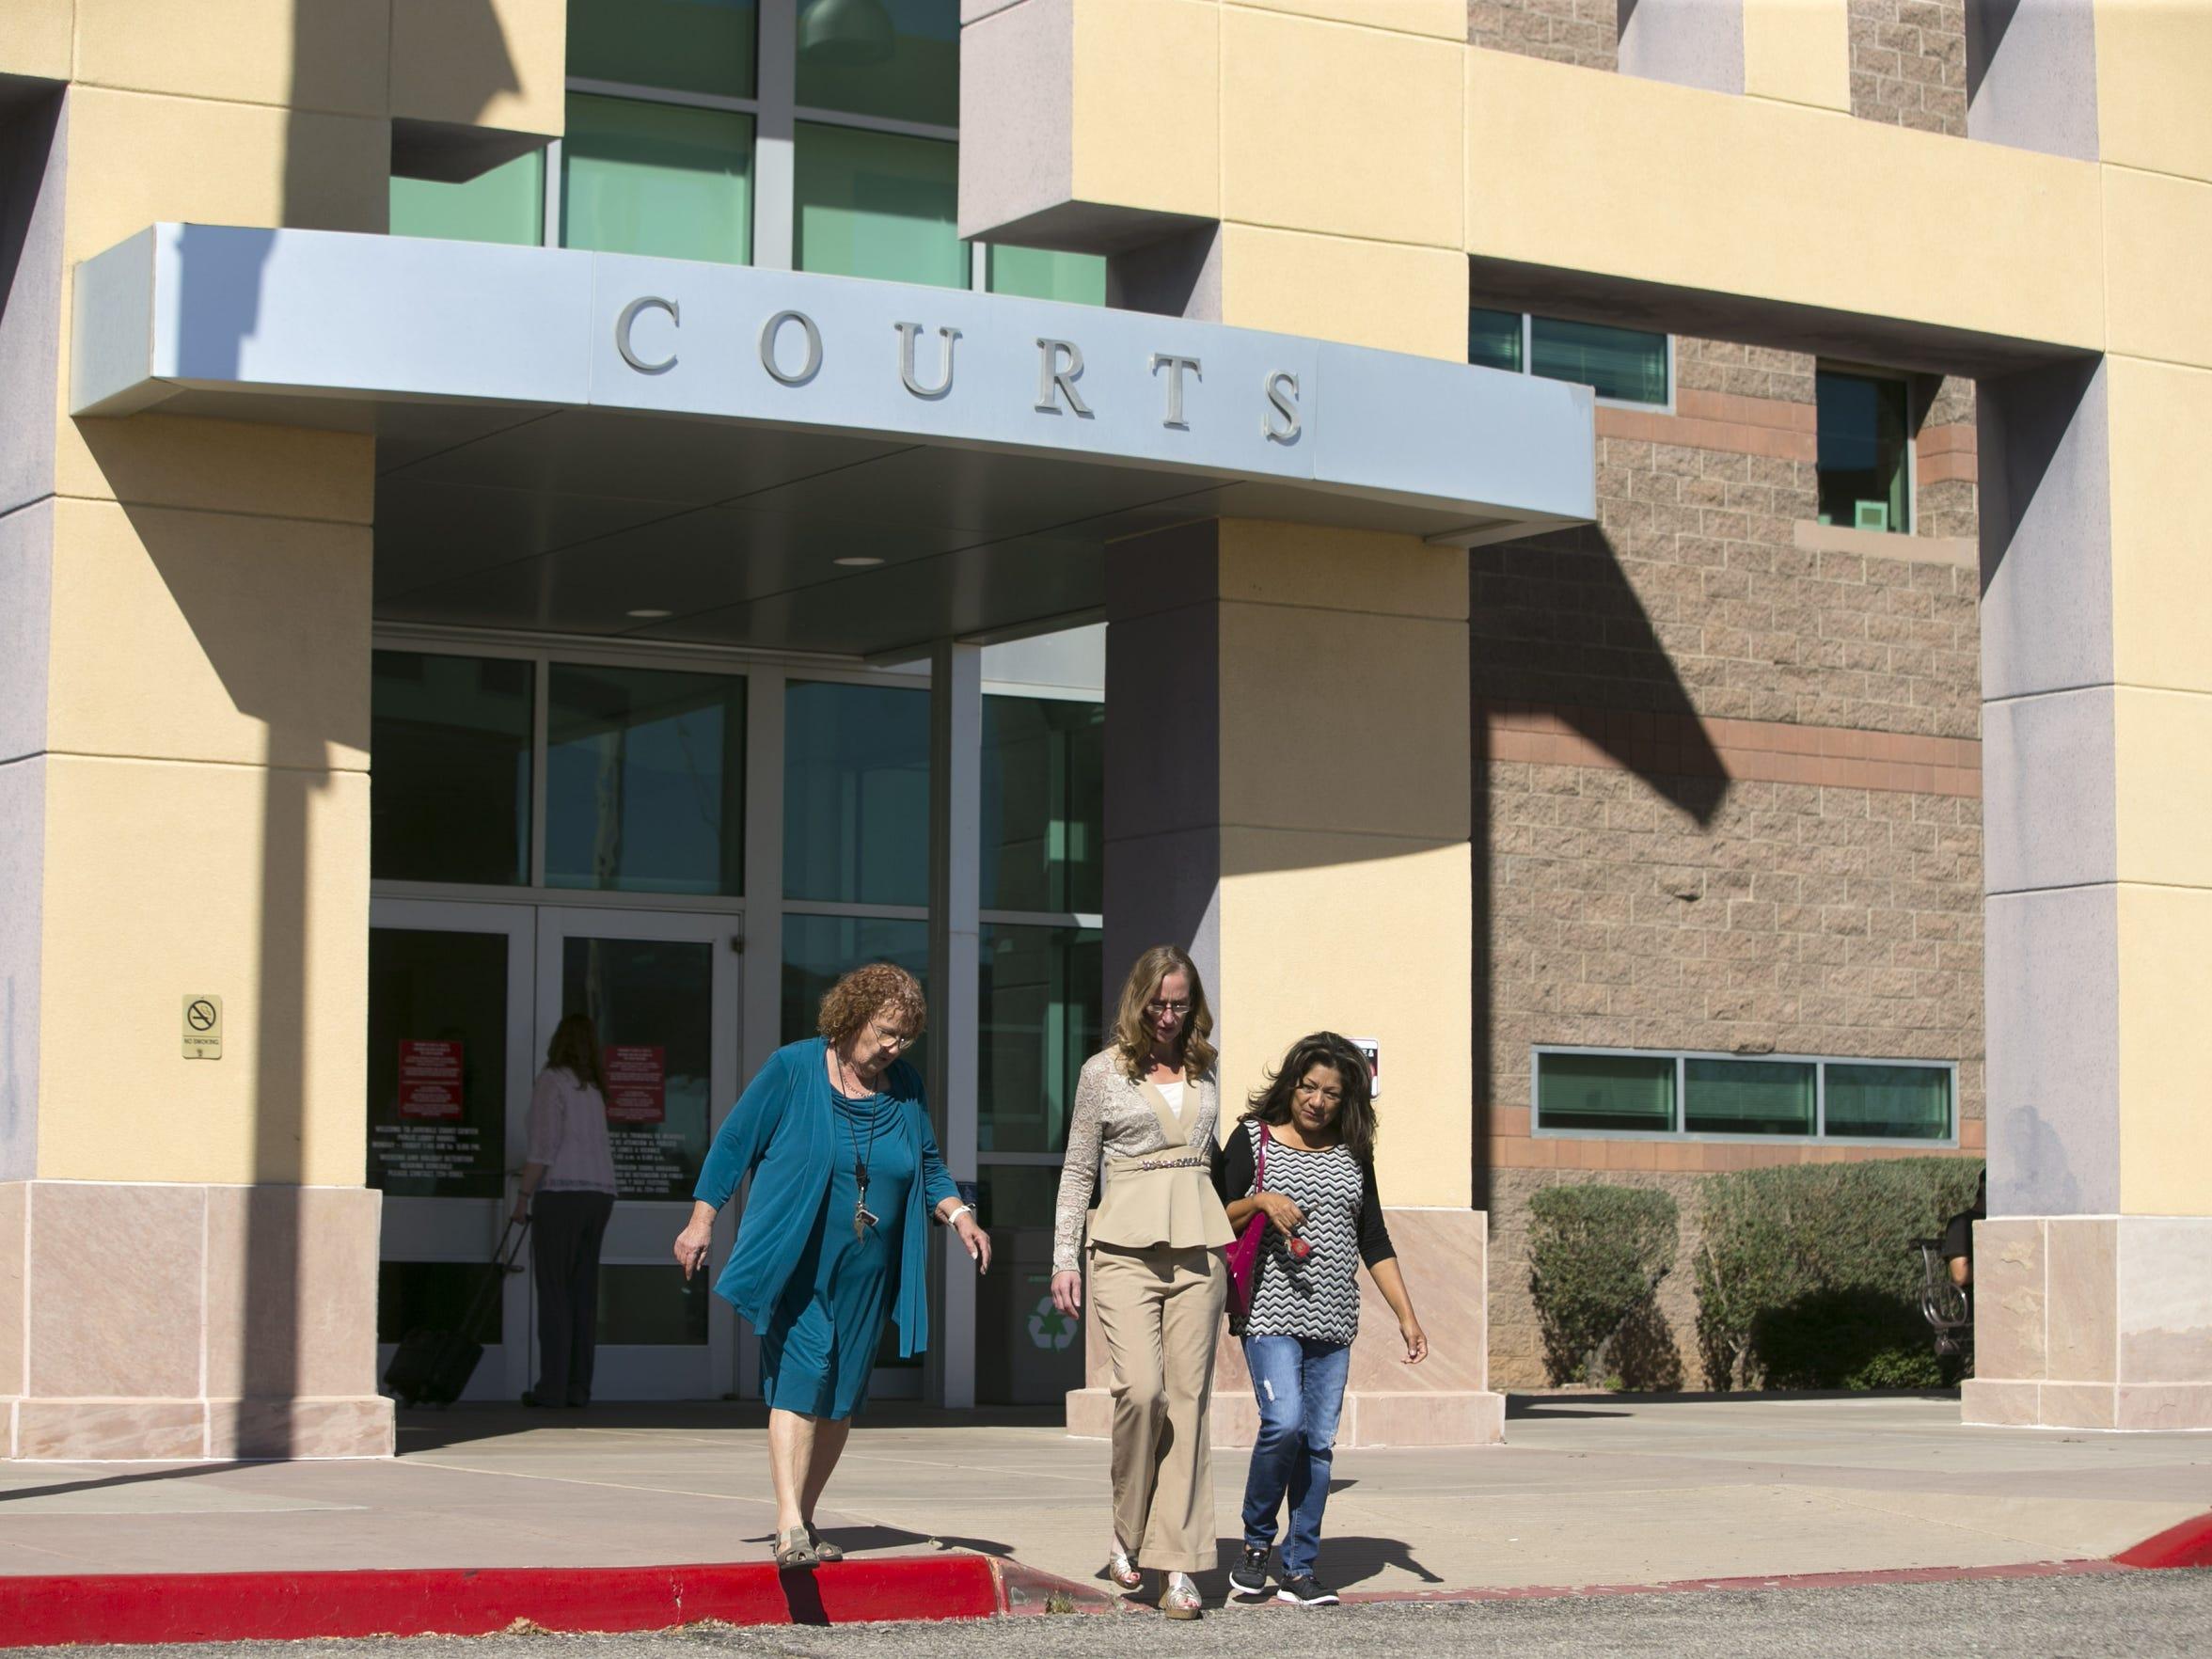 Michelle Calderon (center), of Tucson, walks out of